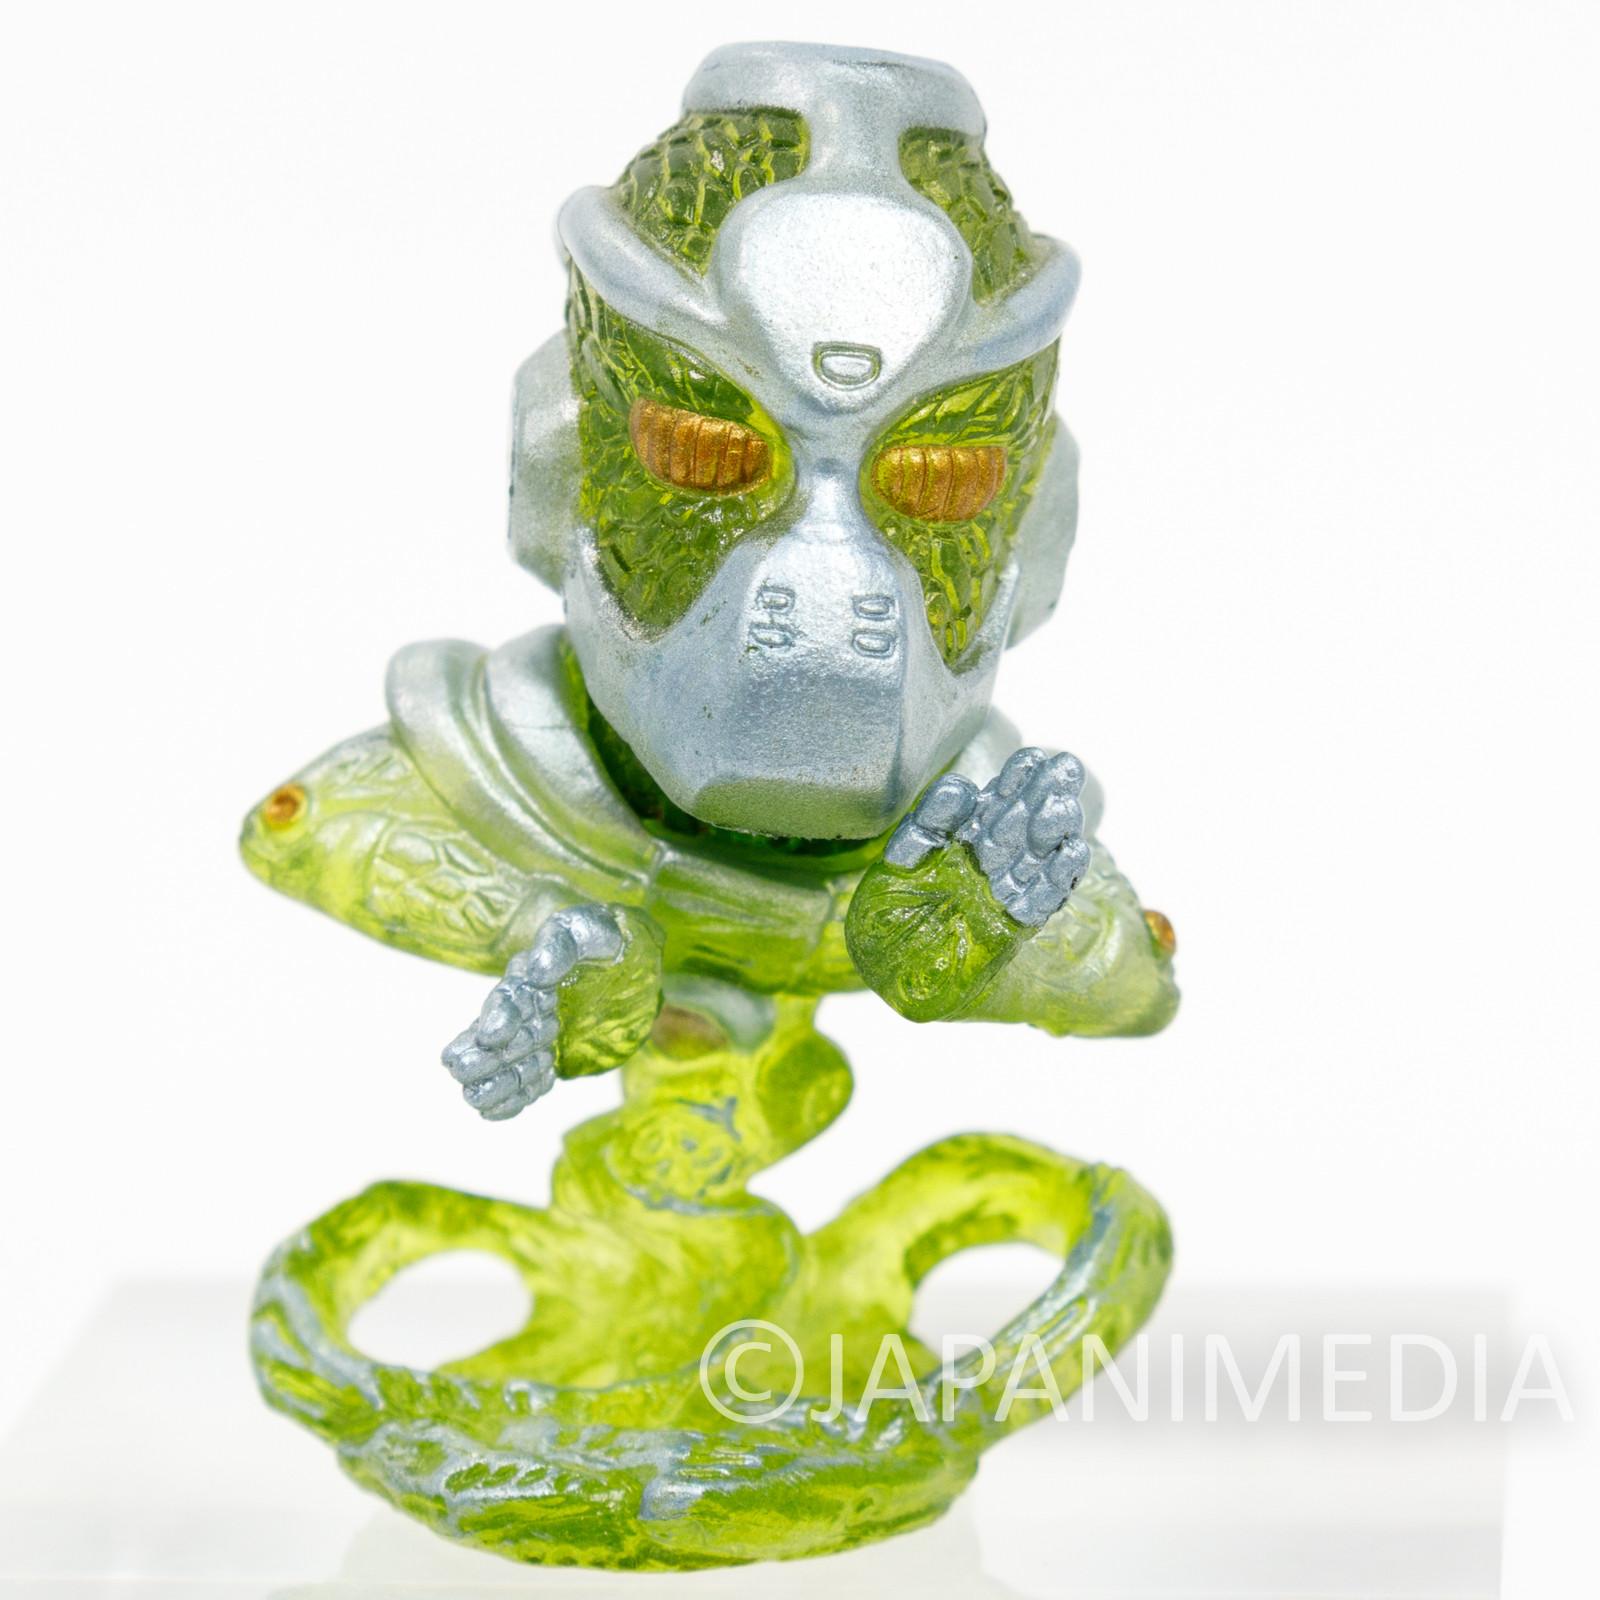 RARE JoJo's Bizarre Adventure Hierophant Green Small Figure Chara Heroes